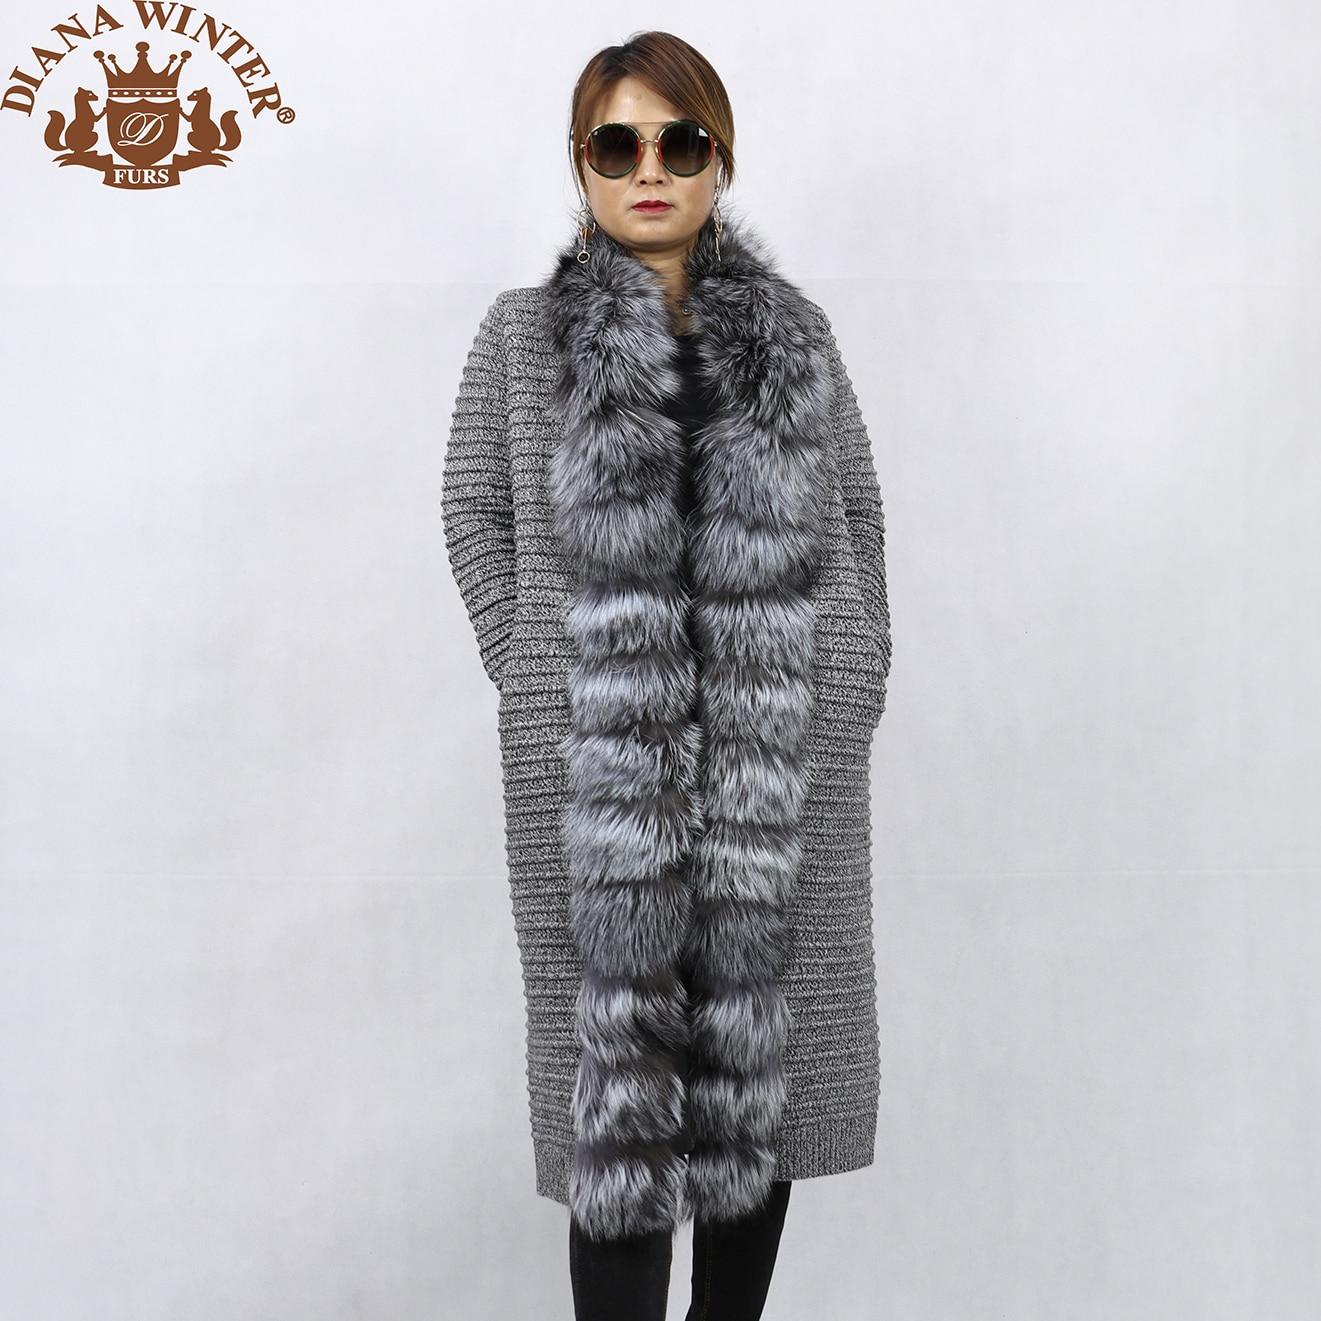 Commuter Sweater DIANA Fashion Jacket Coat Women's Trend To Wool Fur Grass Fox-Fur Keep-Warm